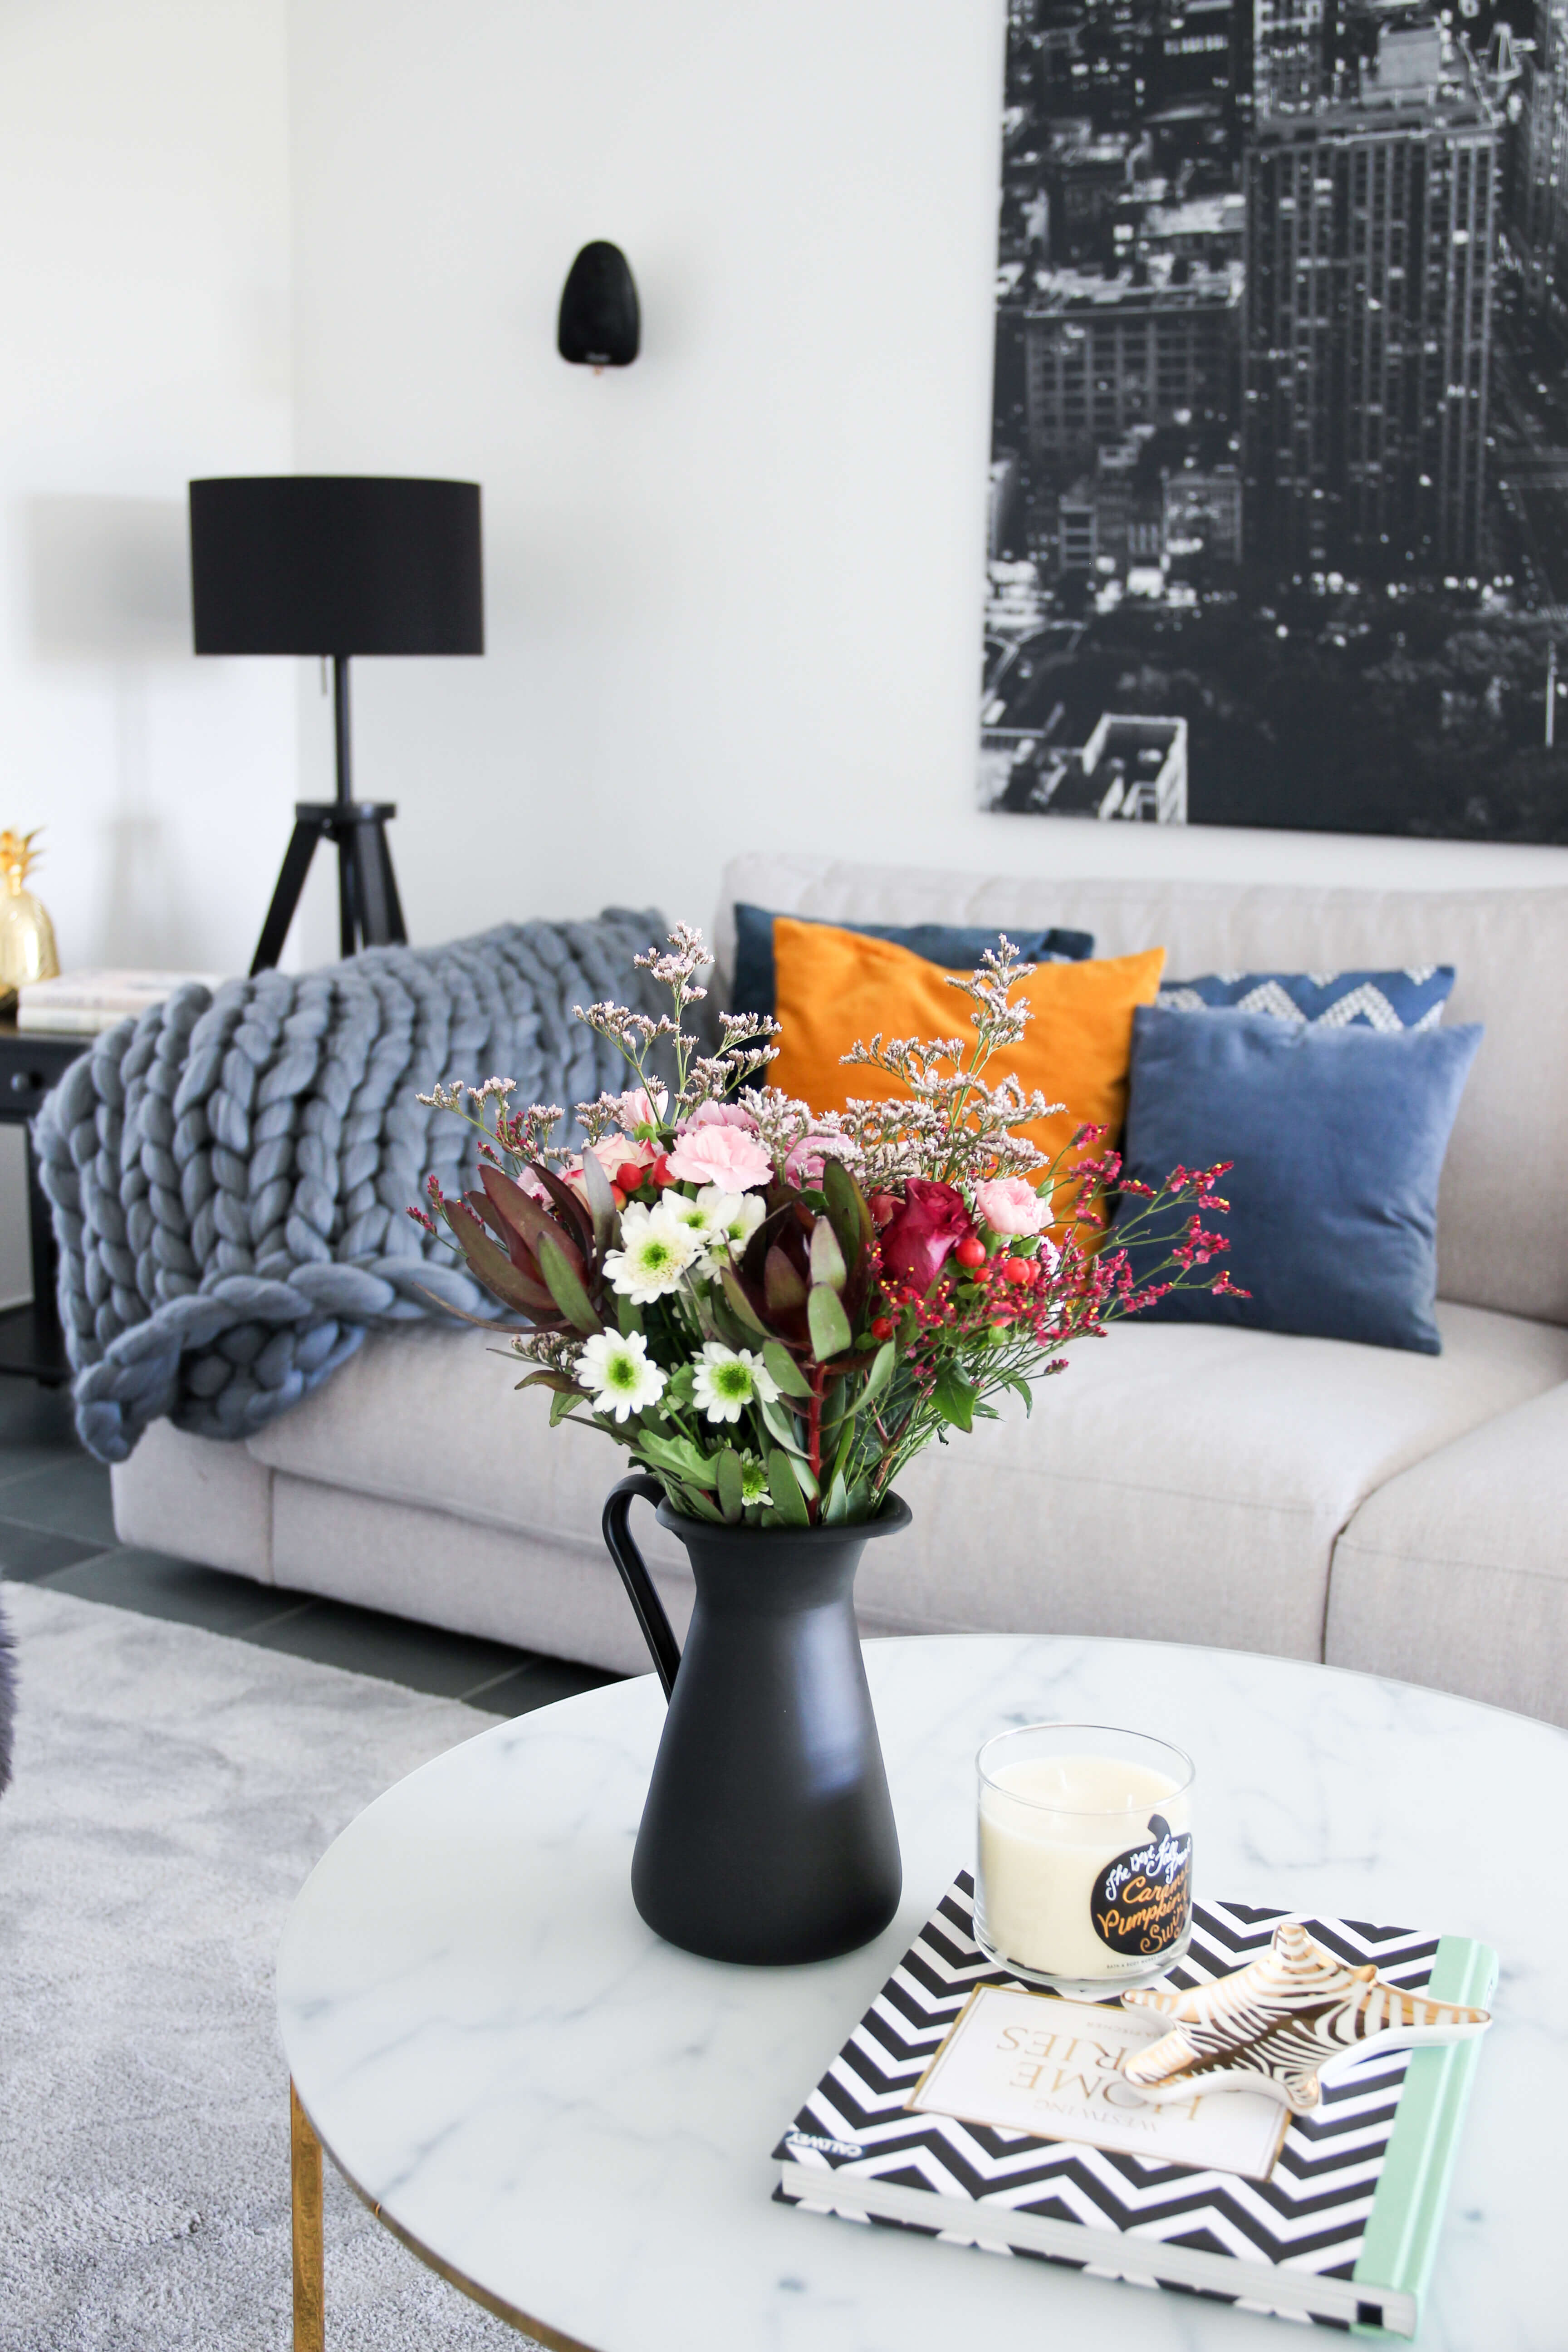 Wohnbereich Umgestaltung Chunky Knit Wolldecke Grobstrick Blume2000.de tantedine